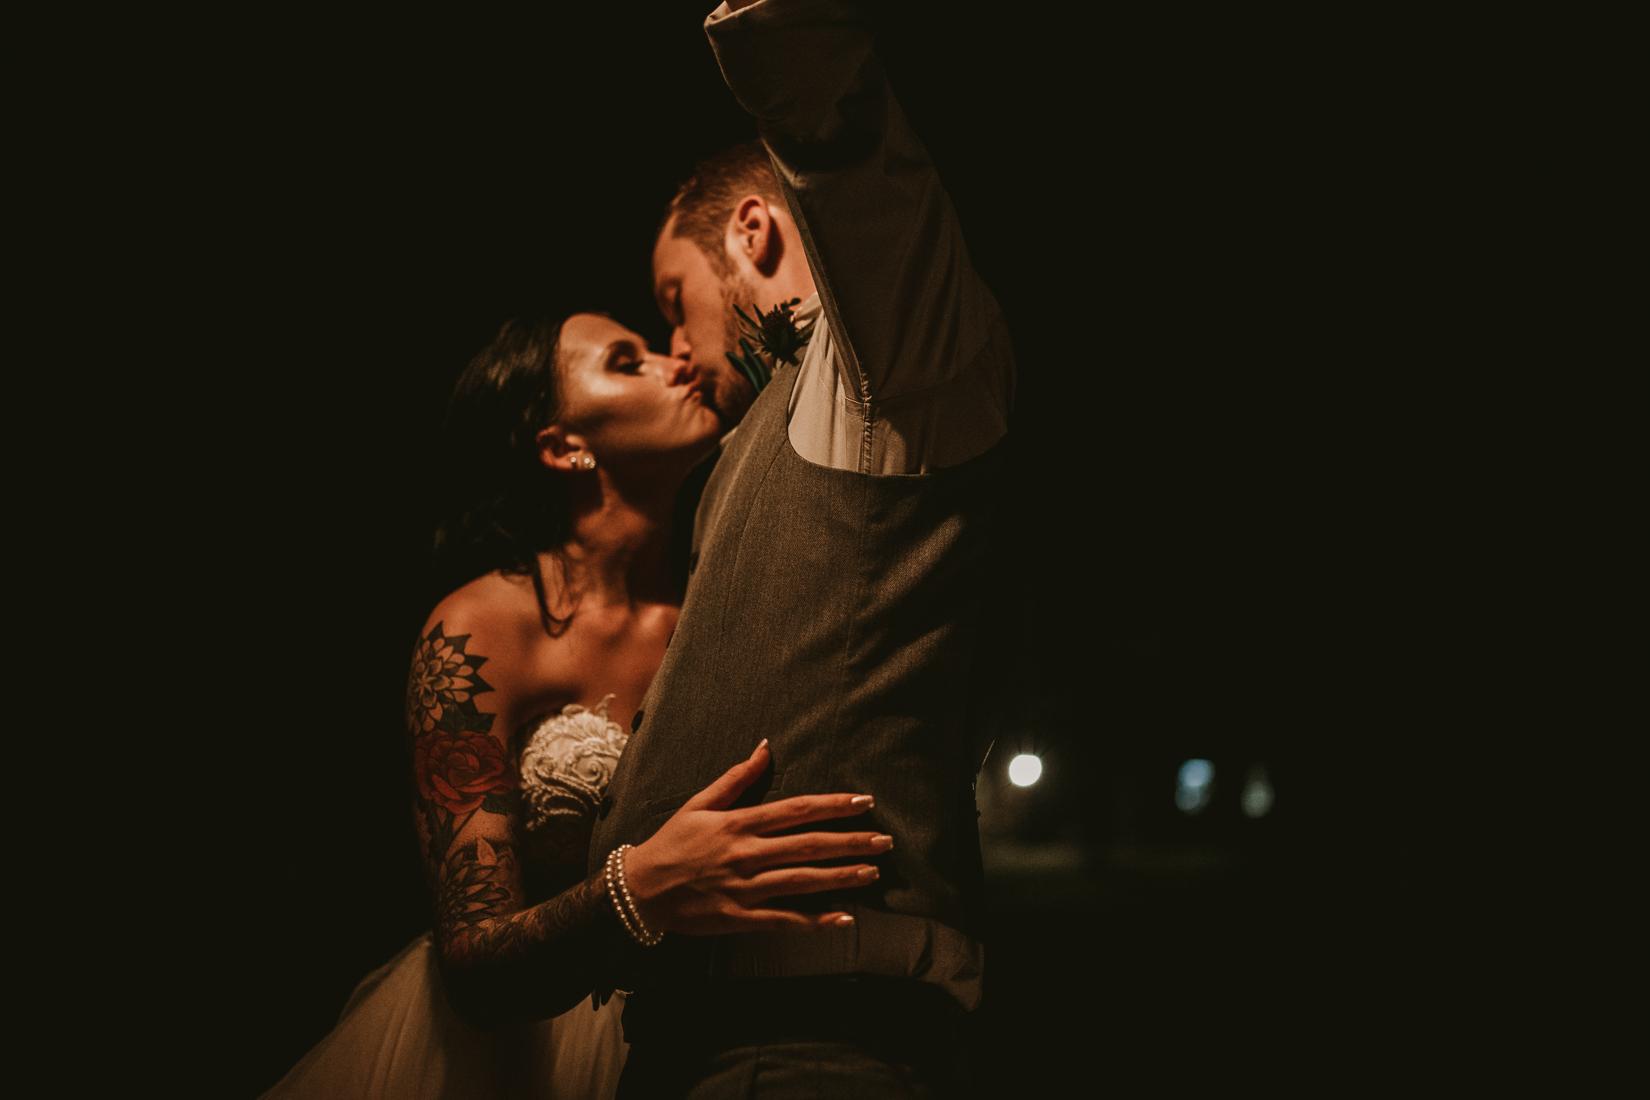 olivia_zay_wedding_09_2018-9257.jpg